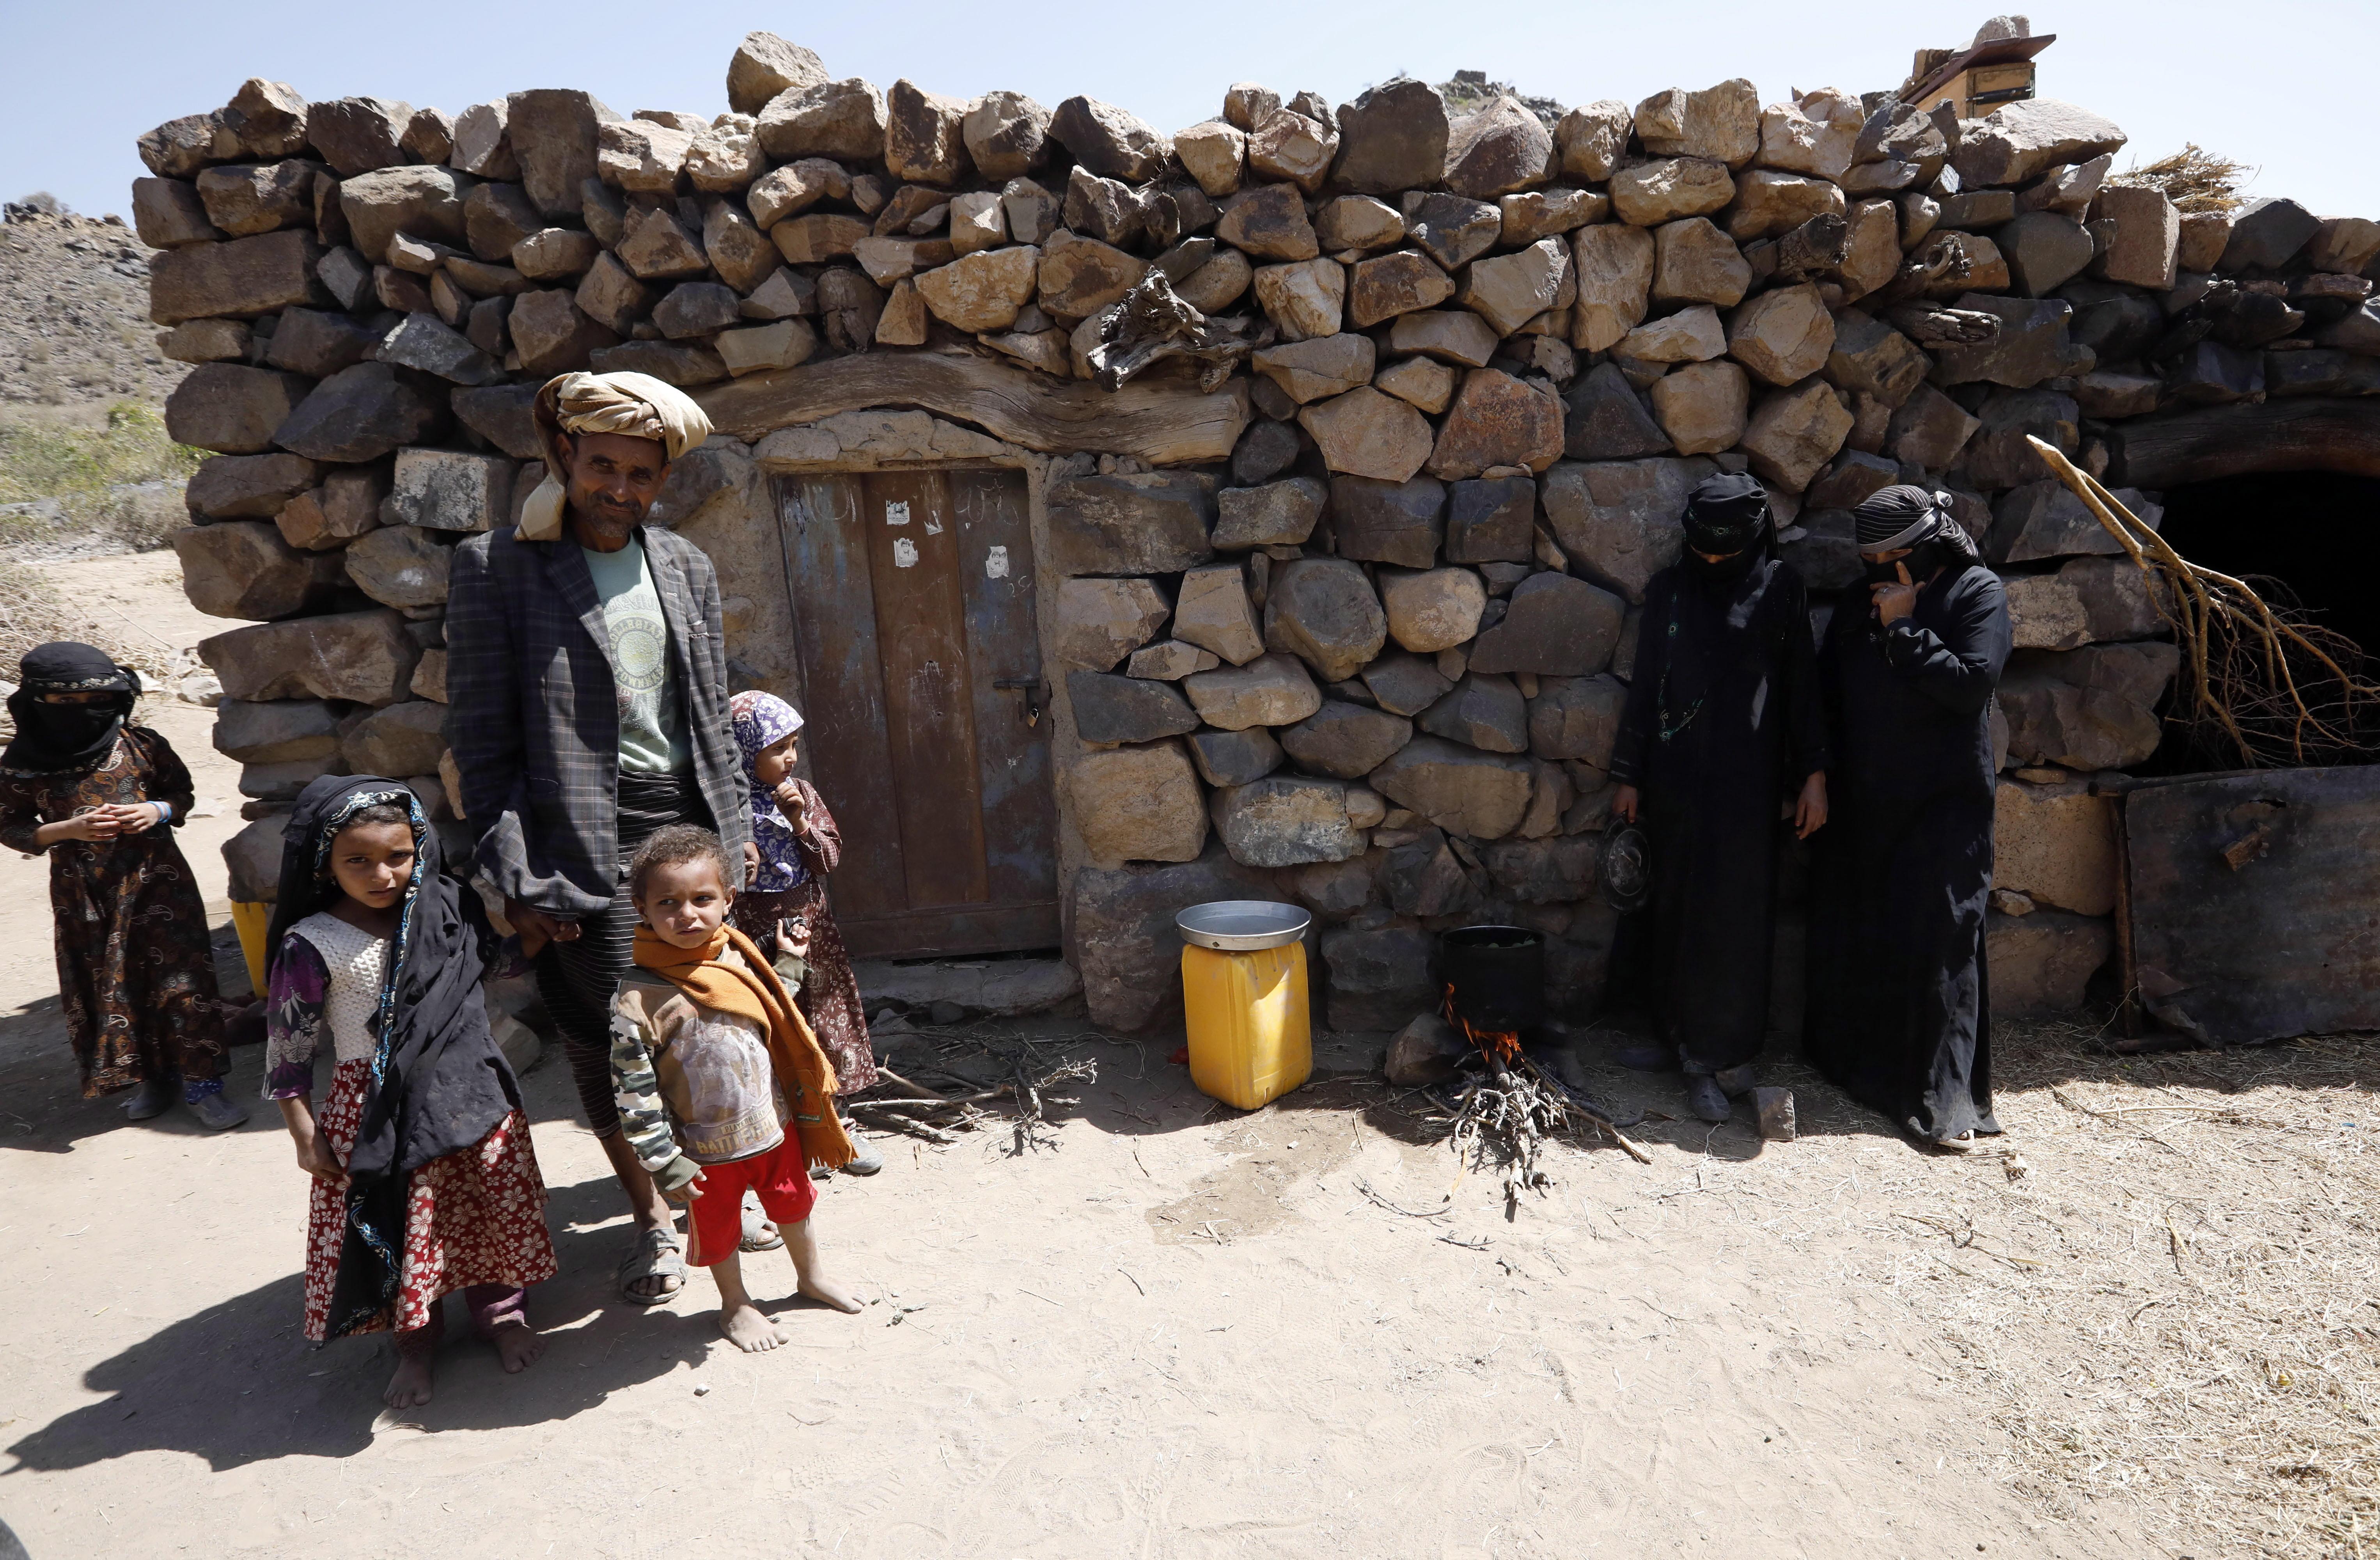 Familia yemení en las montañas de Saná.